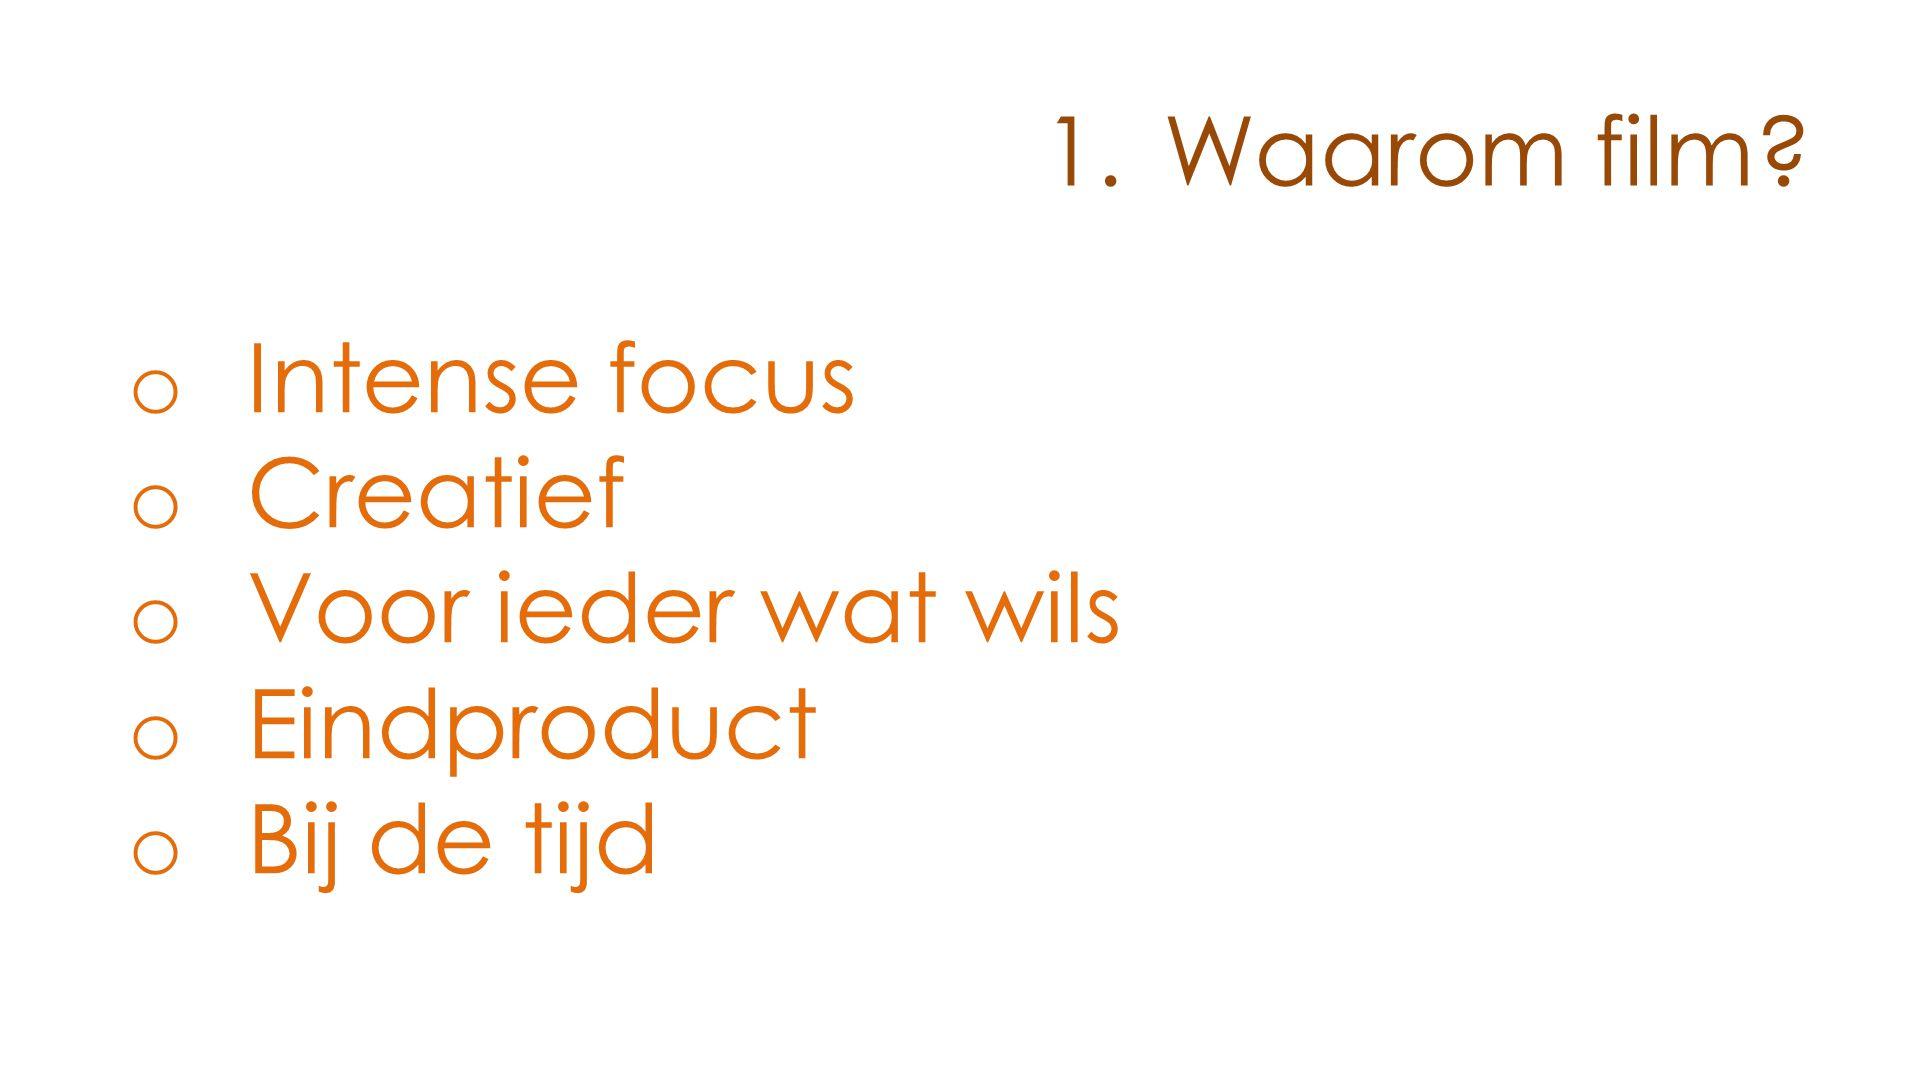 2. De 3d-workshop